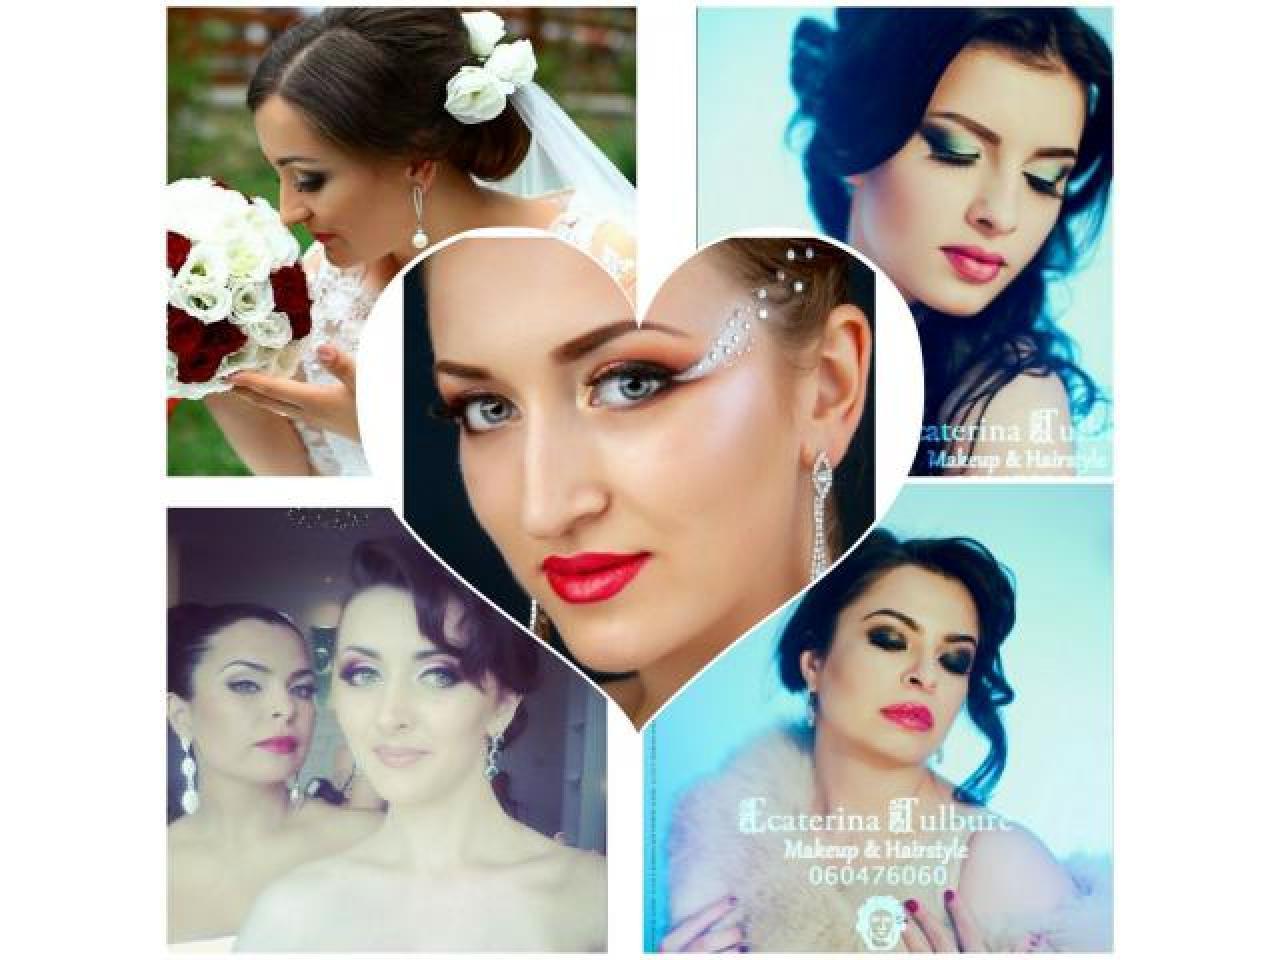 макияж, прически, наращивание ресниц. Makeup, Hairstyle, Eyelash extensions - 2